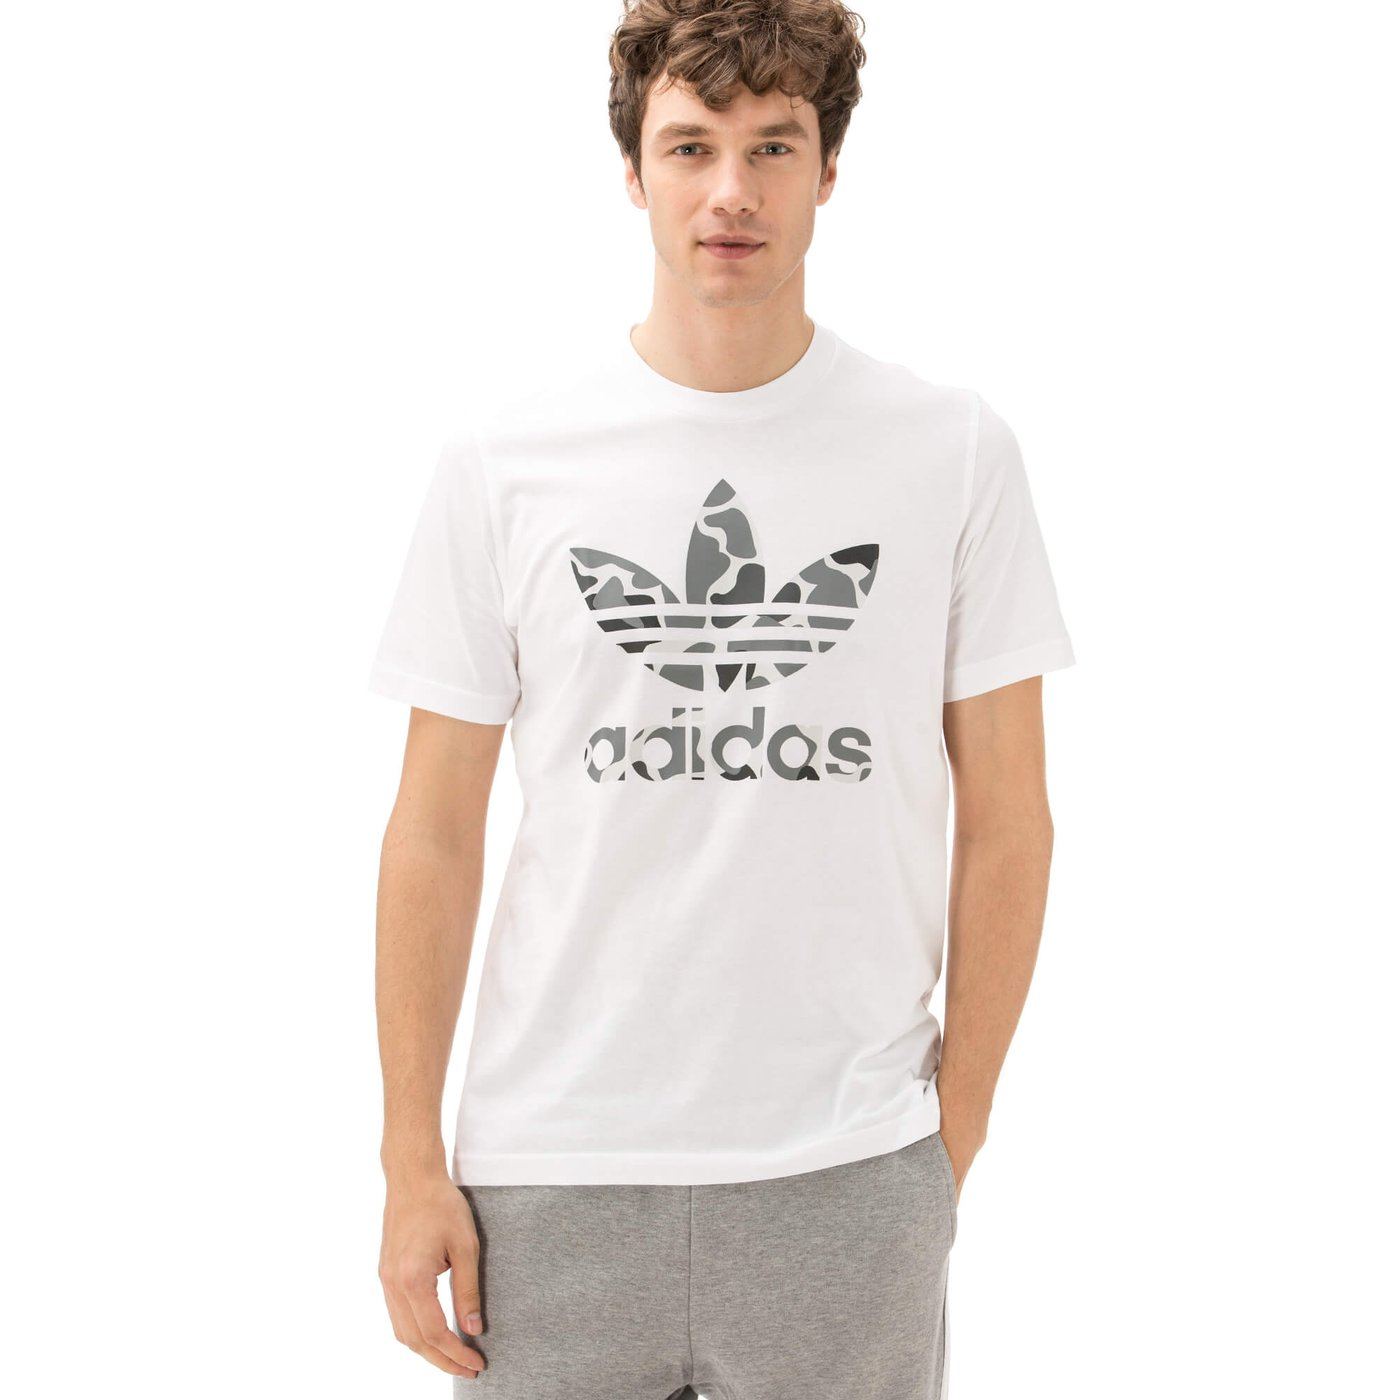 adidas TrefoilErkek Beyaz Tshirt